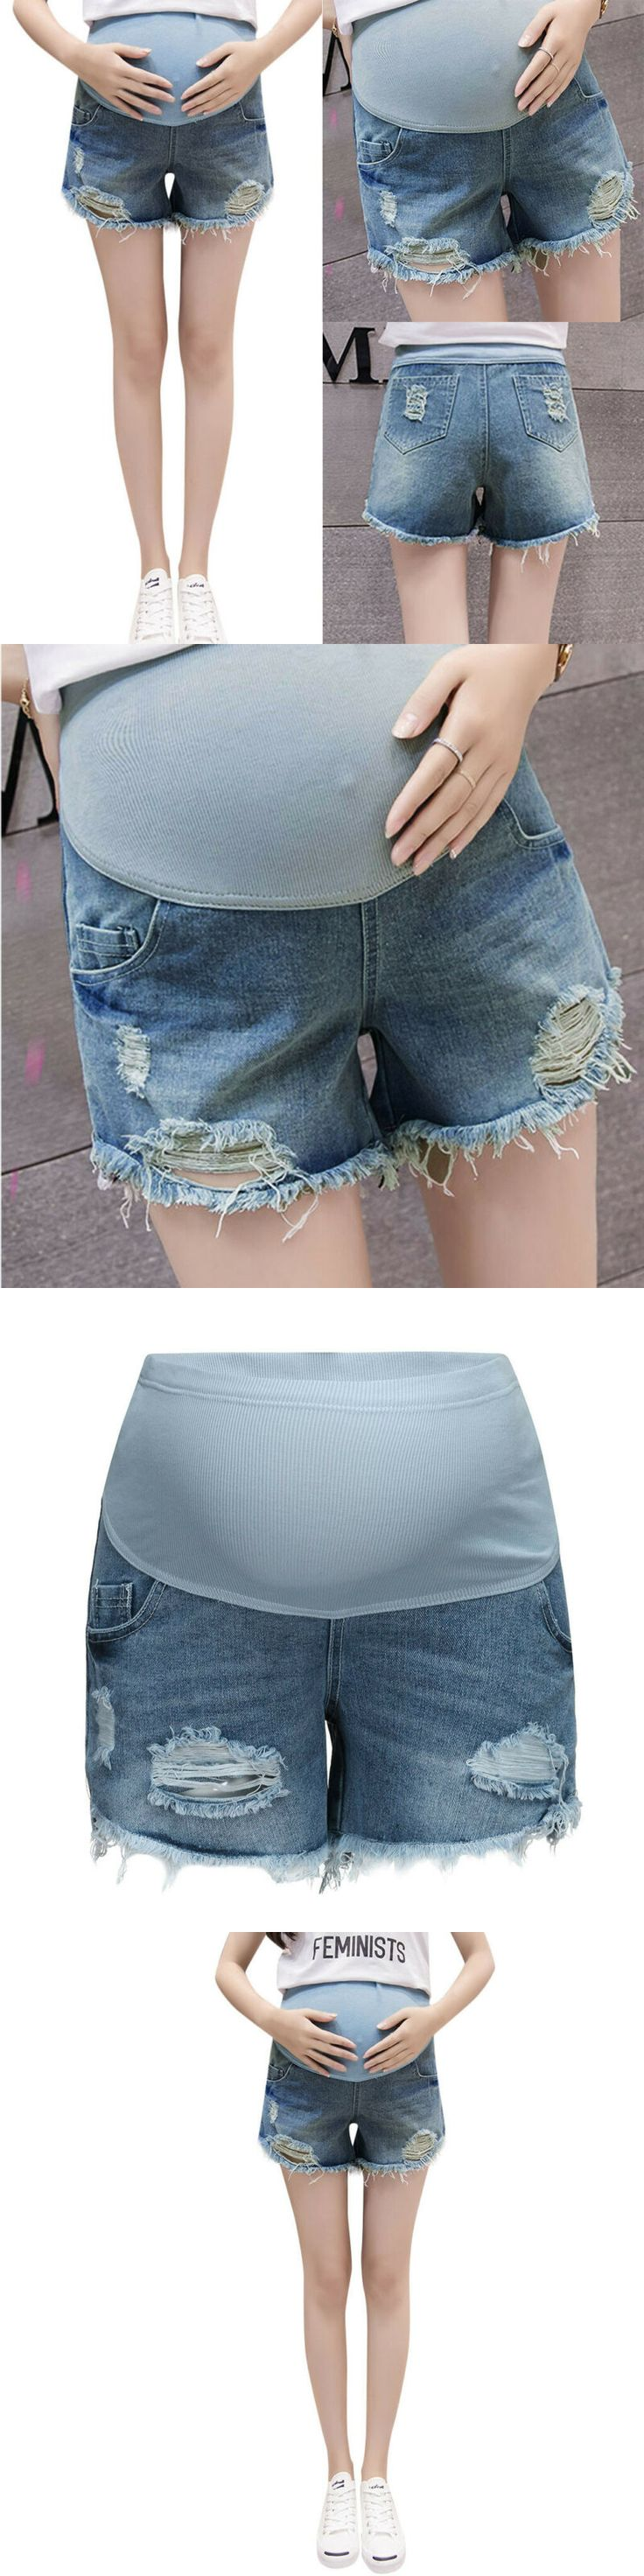 Shorts 15747: Summer Pregnant Woman Ripped Jeans Maternity Solid Shorts Nursing … – Shorts 15747